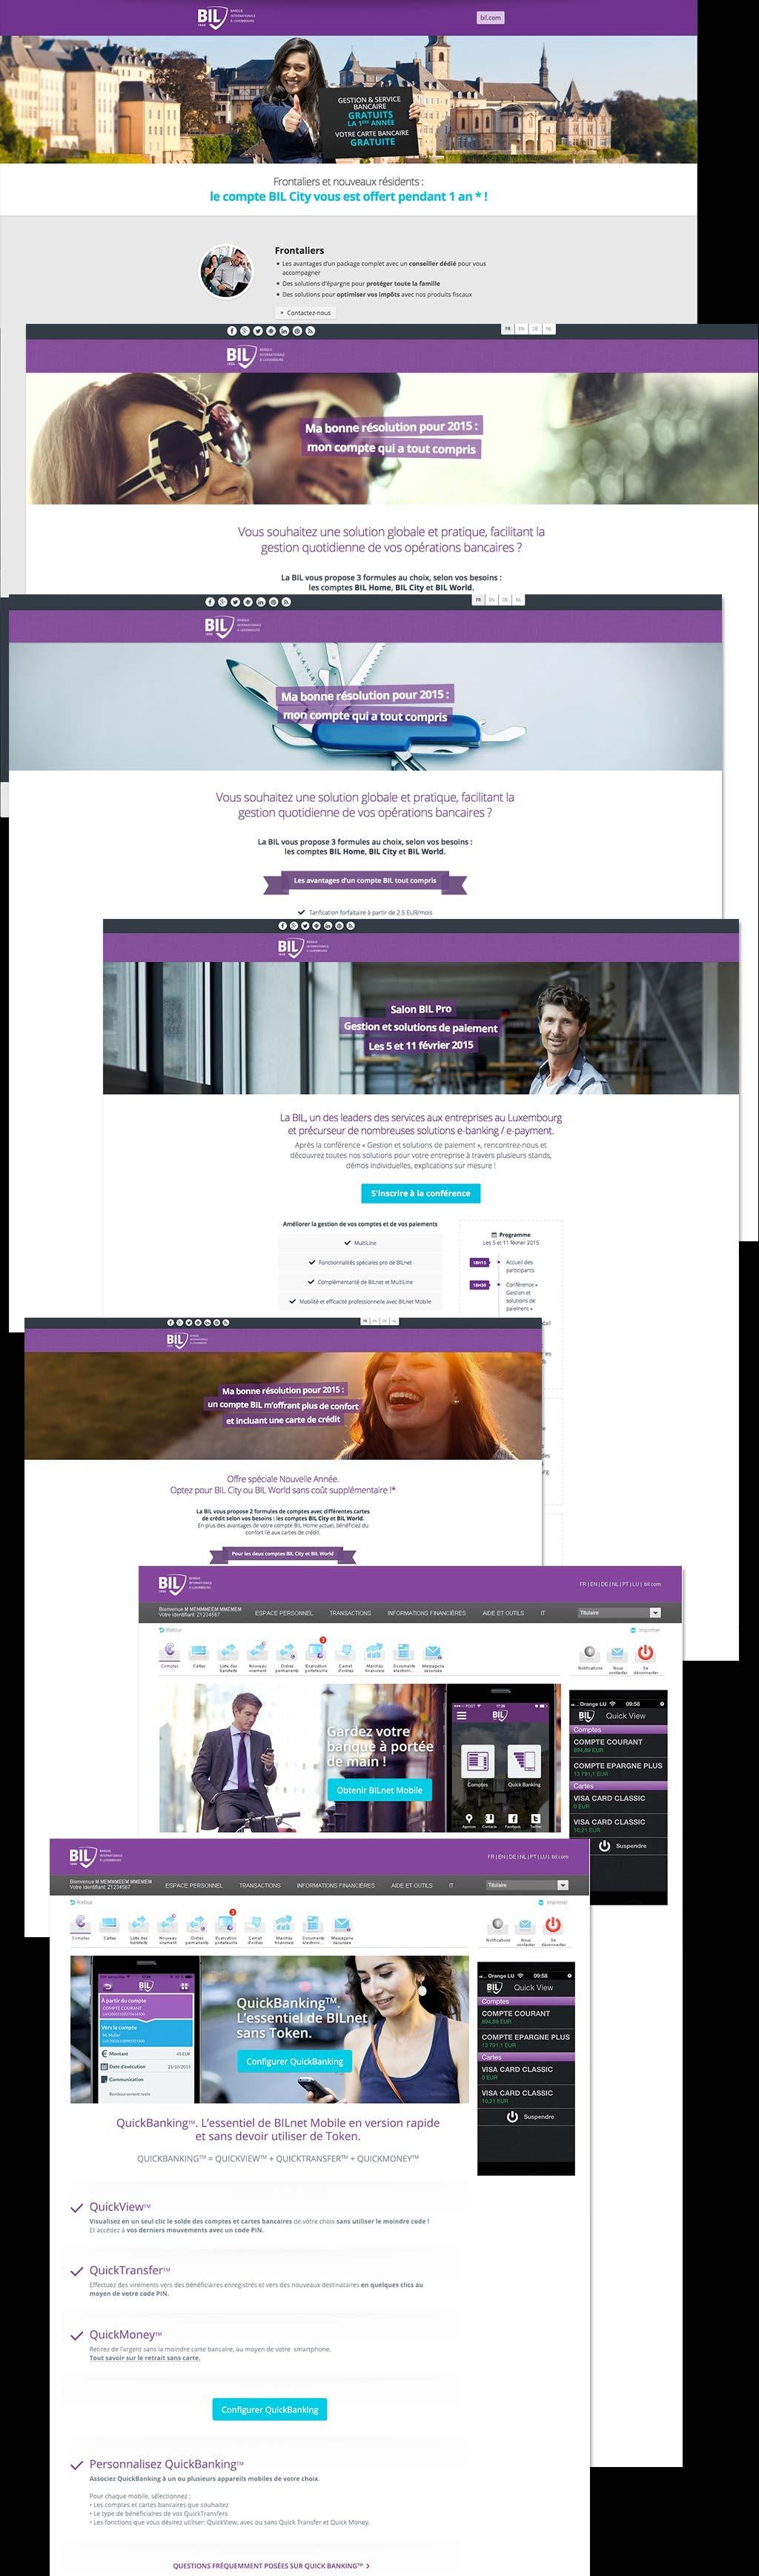 BIL Campagnes digitales